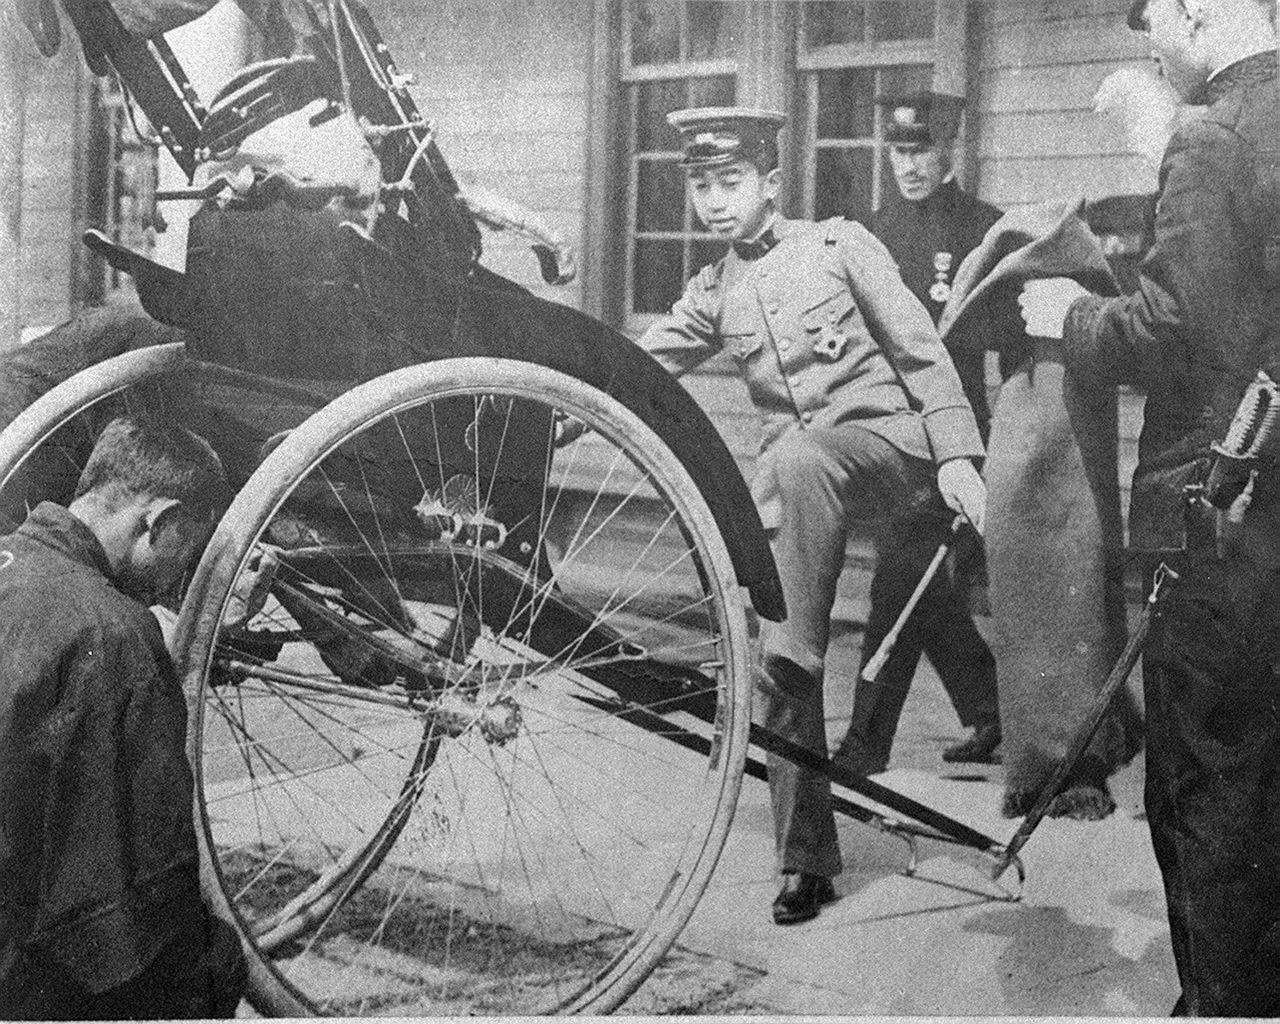 Четырнадцатилетний Хирохито в форме лейтенанта армии садится на повозку дзинрикися в районе Сага в Киото 7 апреля 1916 г. (© «Ёмиури симбун»)